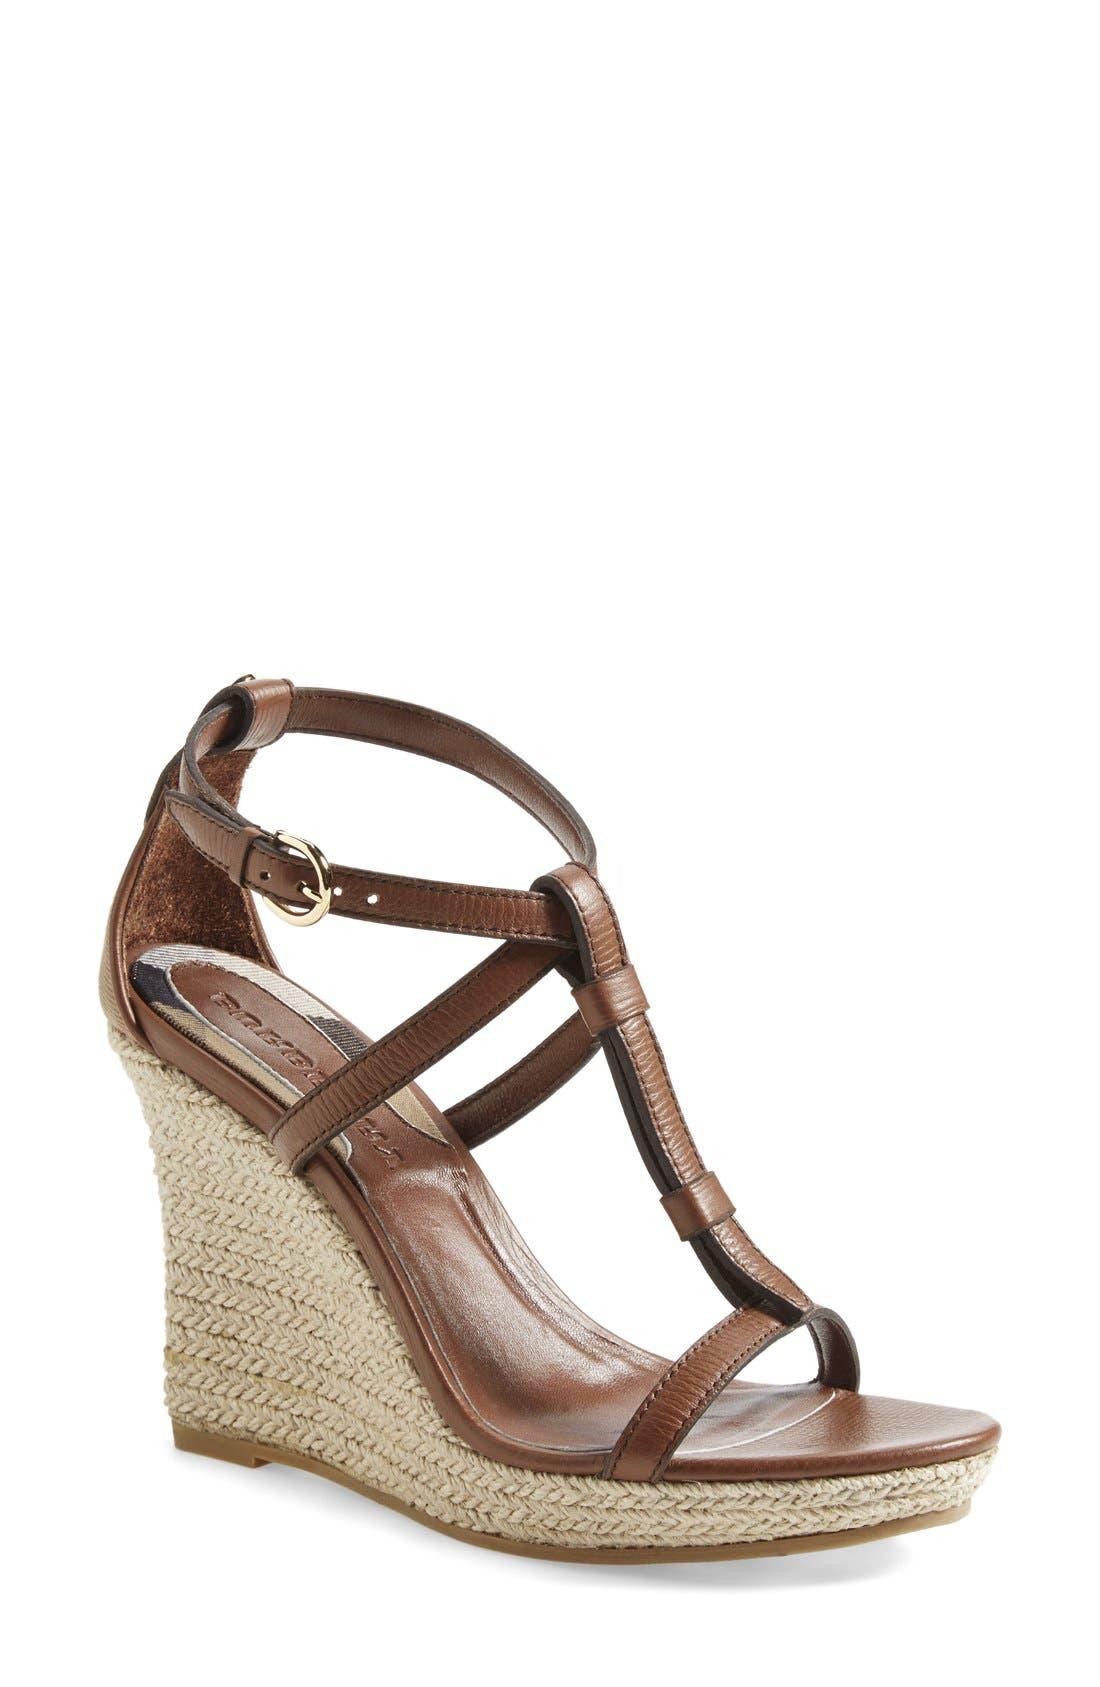 Alternate Image 1 Selected - Burberry 'Wedland' Espadrille Wedge Sandal (Women)